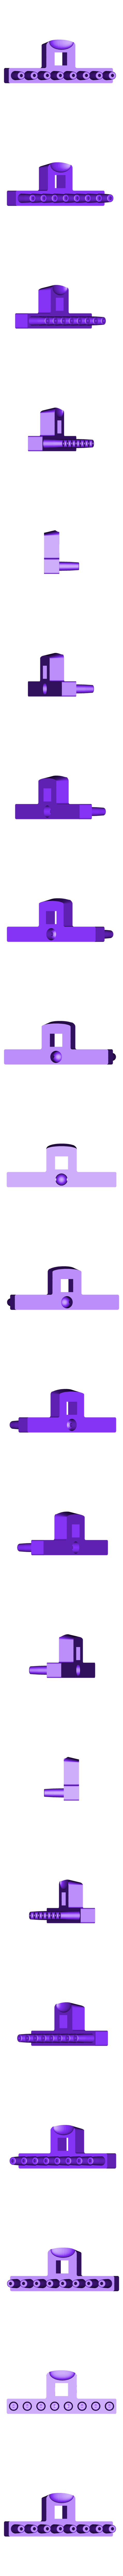 thing_2.stl Download free STL file 8 Channels vacuum aspirator • 3D printing model, cyrus